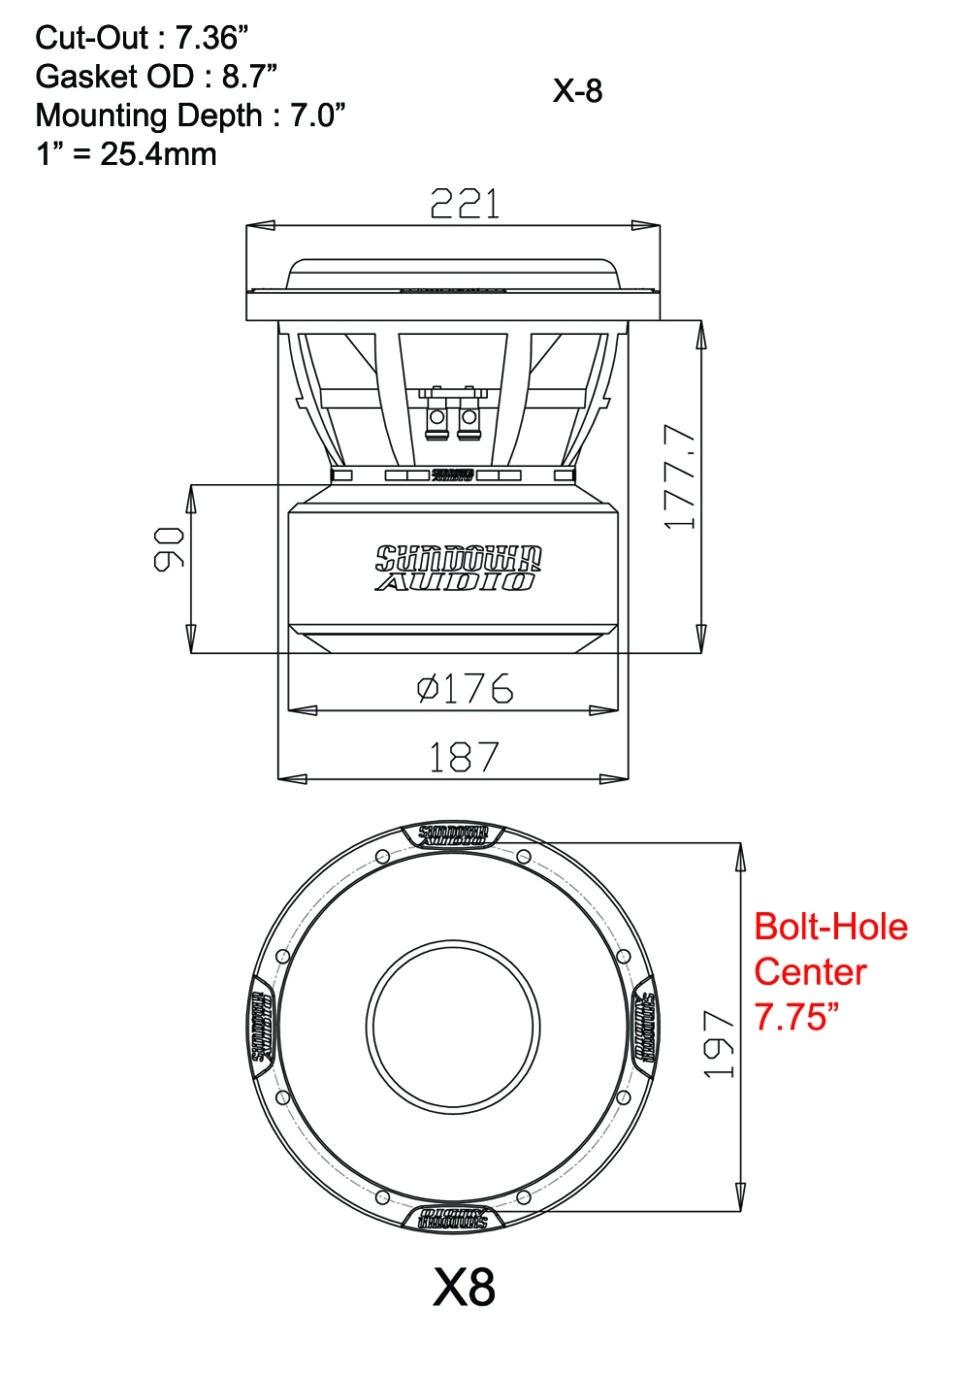 Kicker Cvr 12 Wiring Diagram as Well Kicker Cvr 12 Wiring Diagram Furthermore Dual 2 Ohm Sub